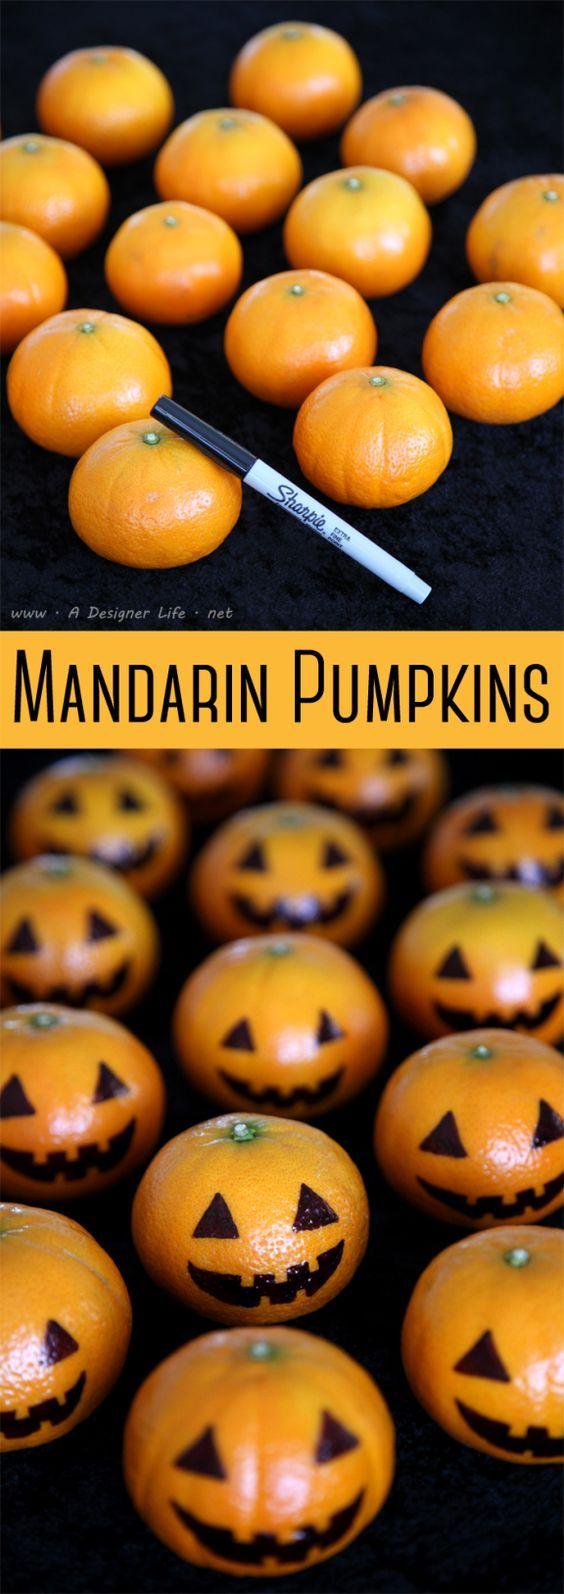 Mandarin Pumpkins. 5 Easy Halloween Food Ideas